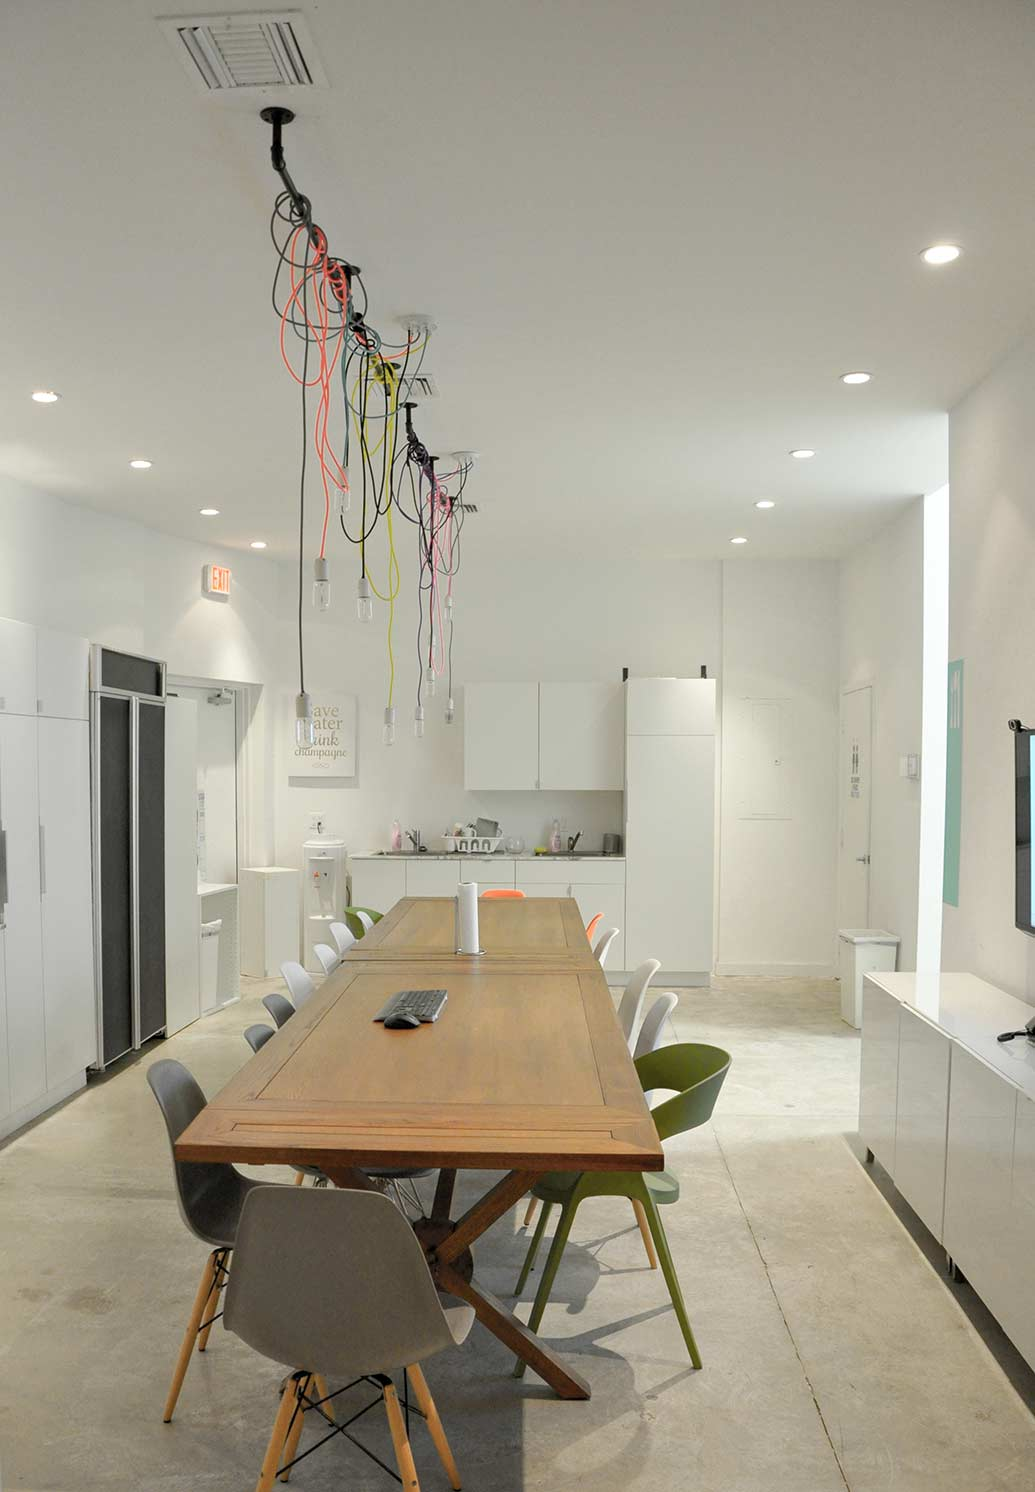 Florida Interior Design Studio Rightly Illuminated With CASA LIGHTING